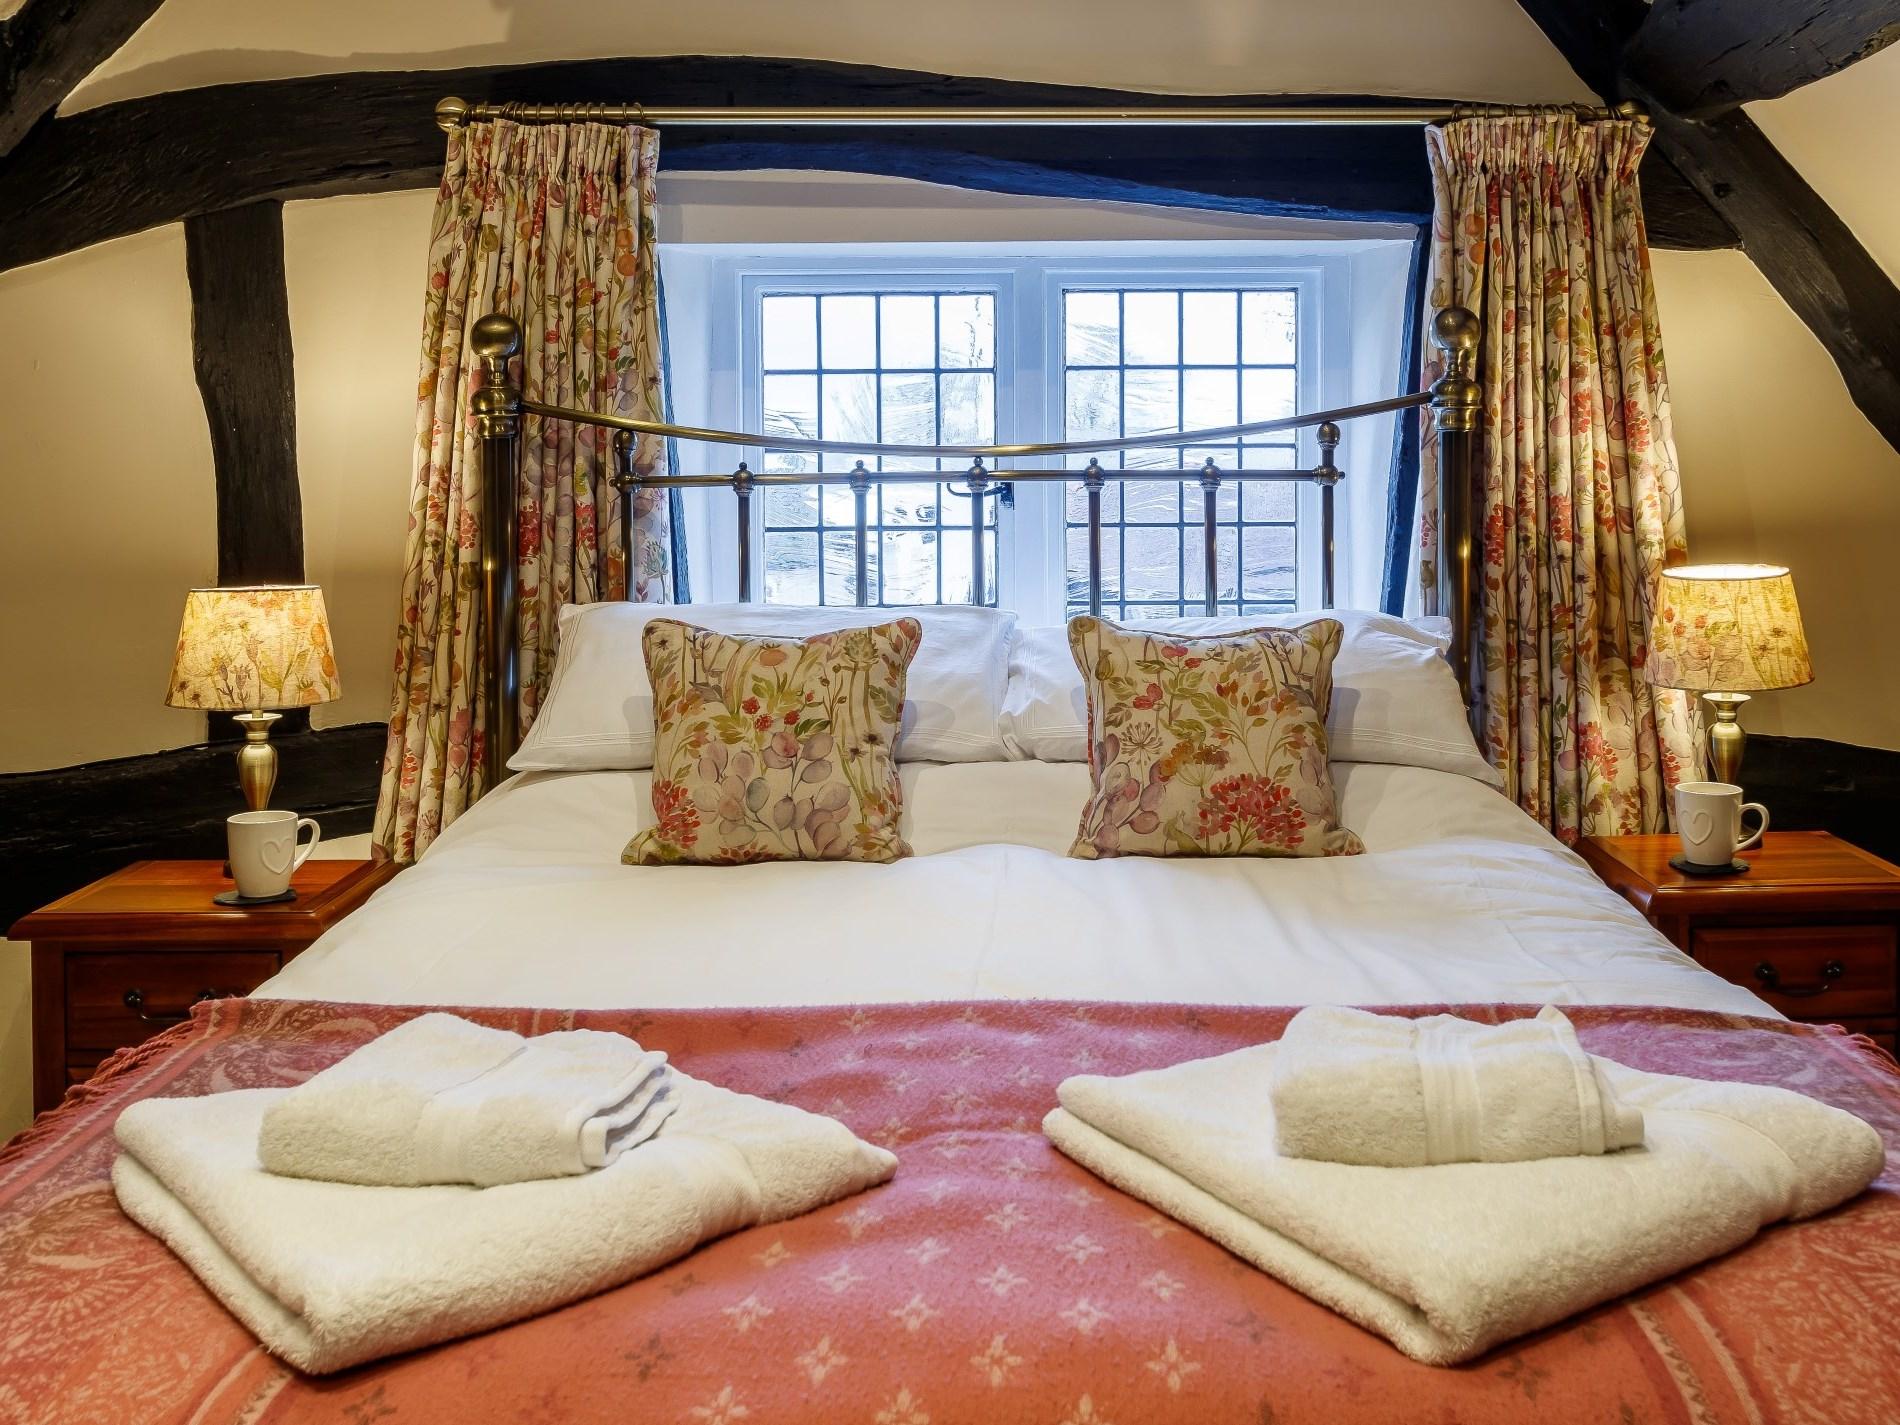 2 Bedroom Cottage in Evesham, Heart of England